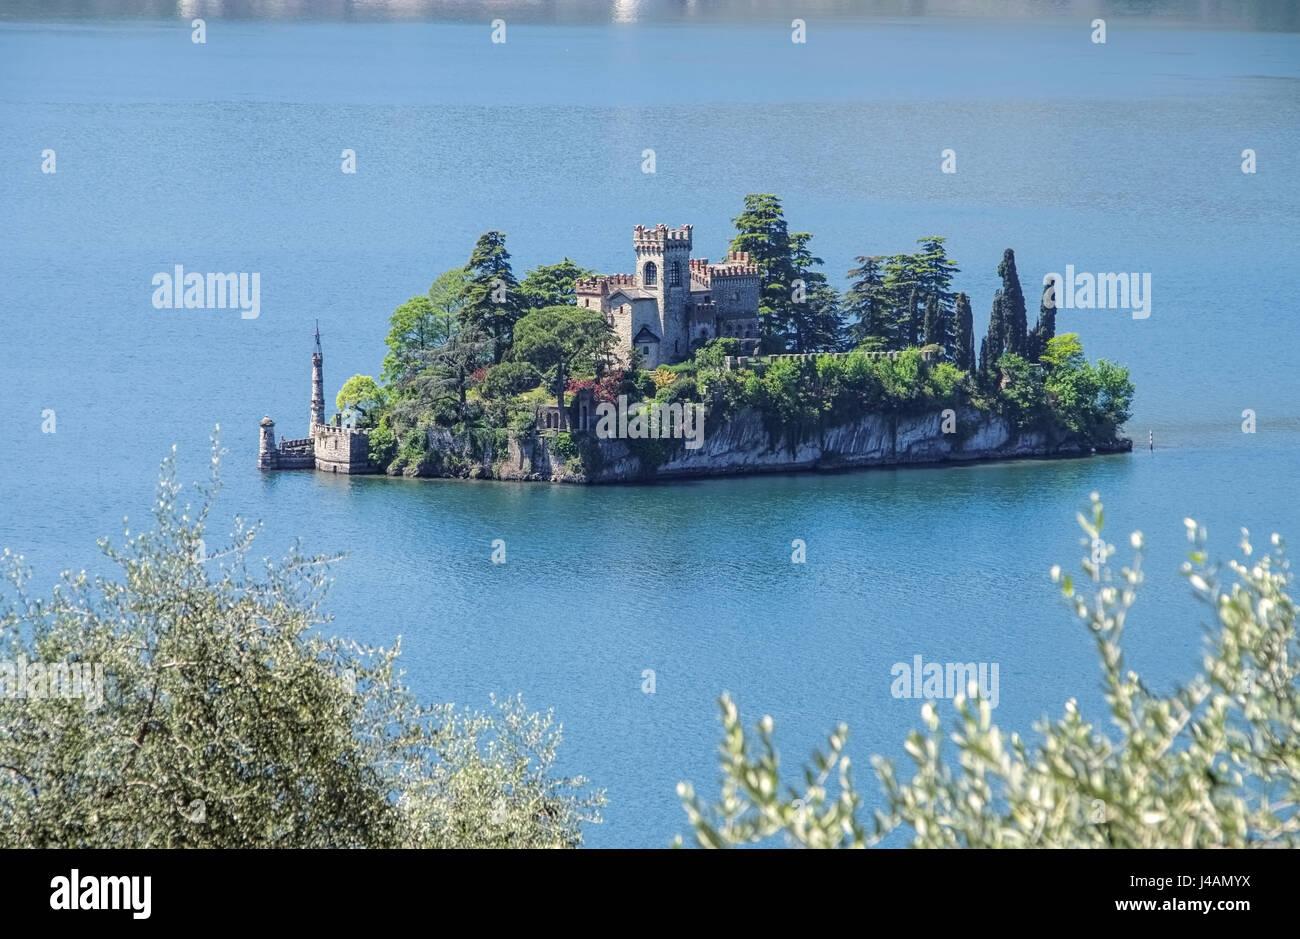 Loreto island in Iseo lake, Lombardy in Italy - Stock Image